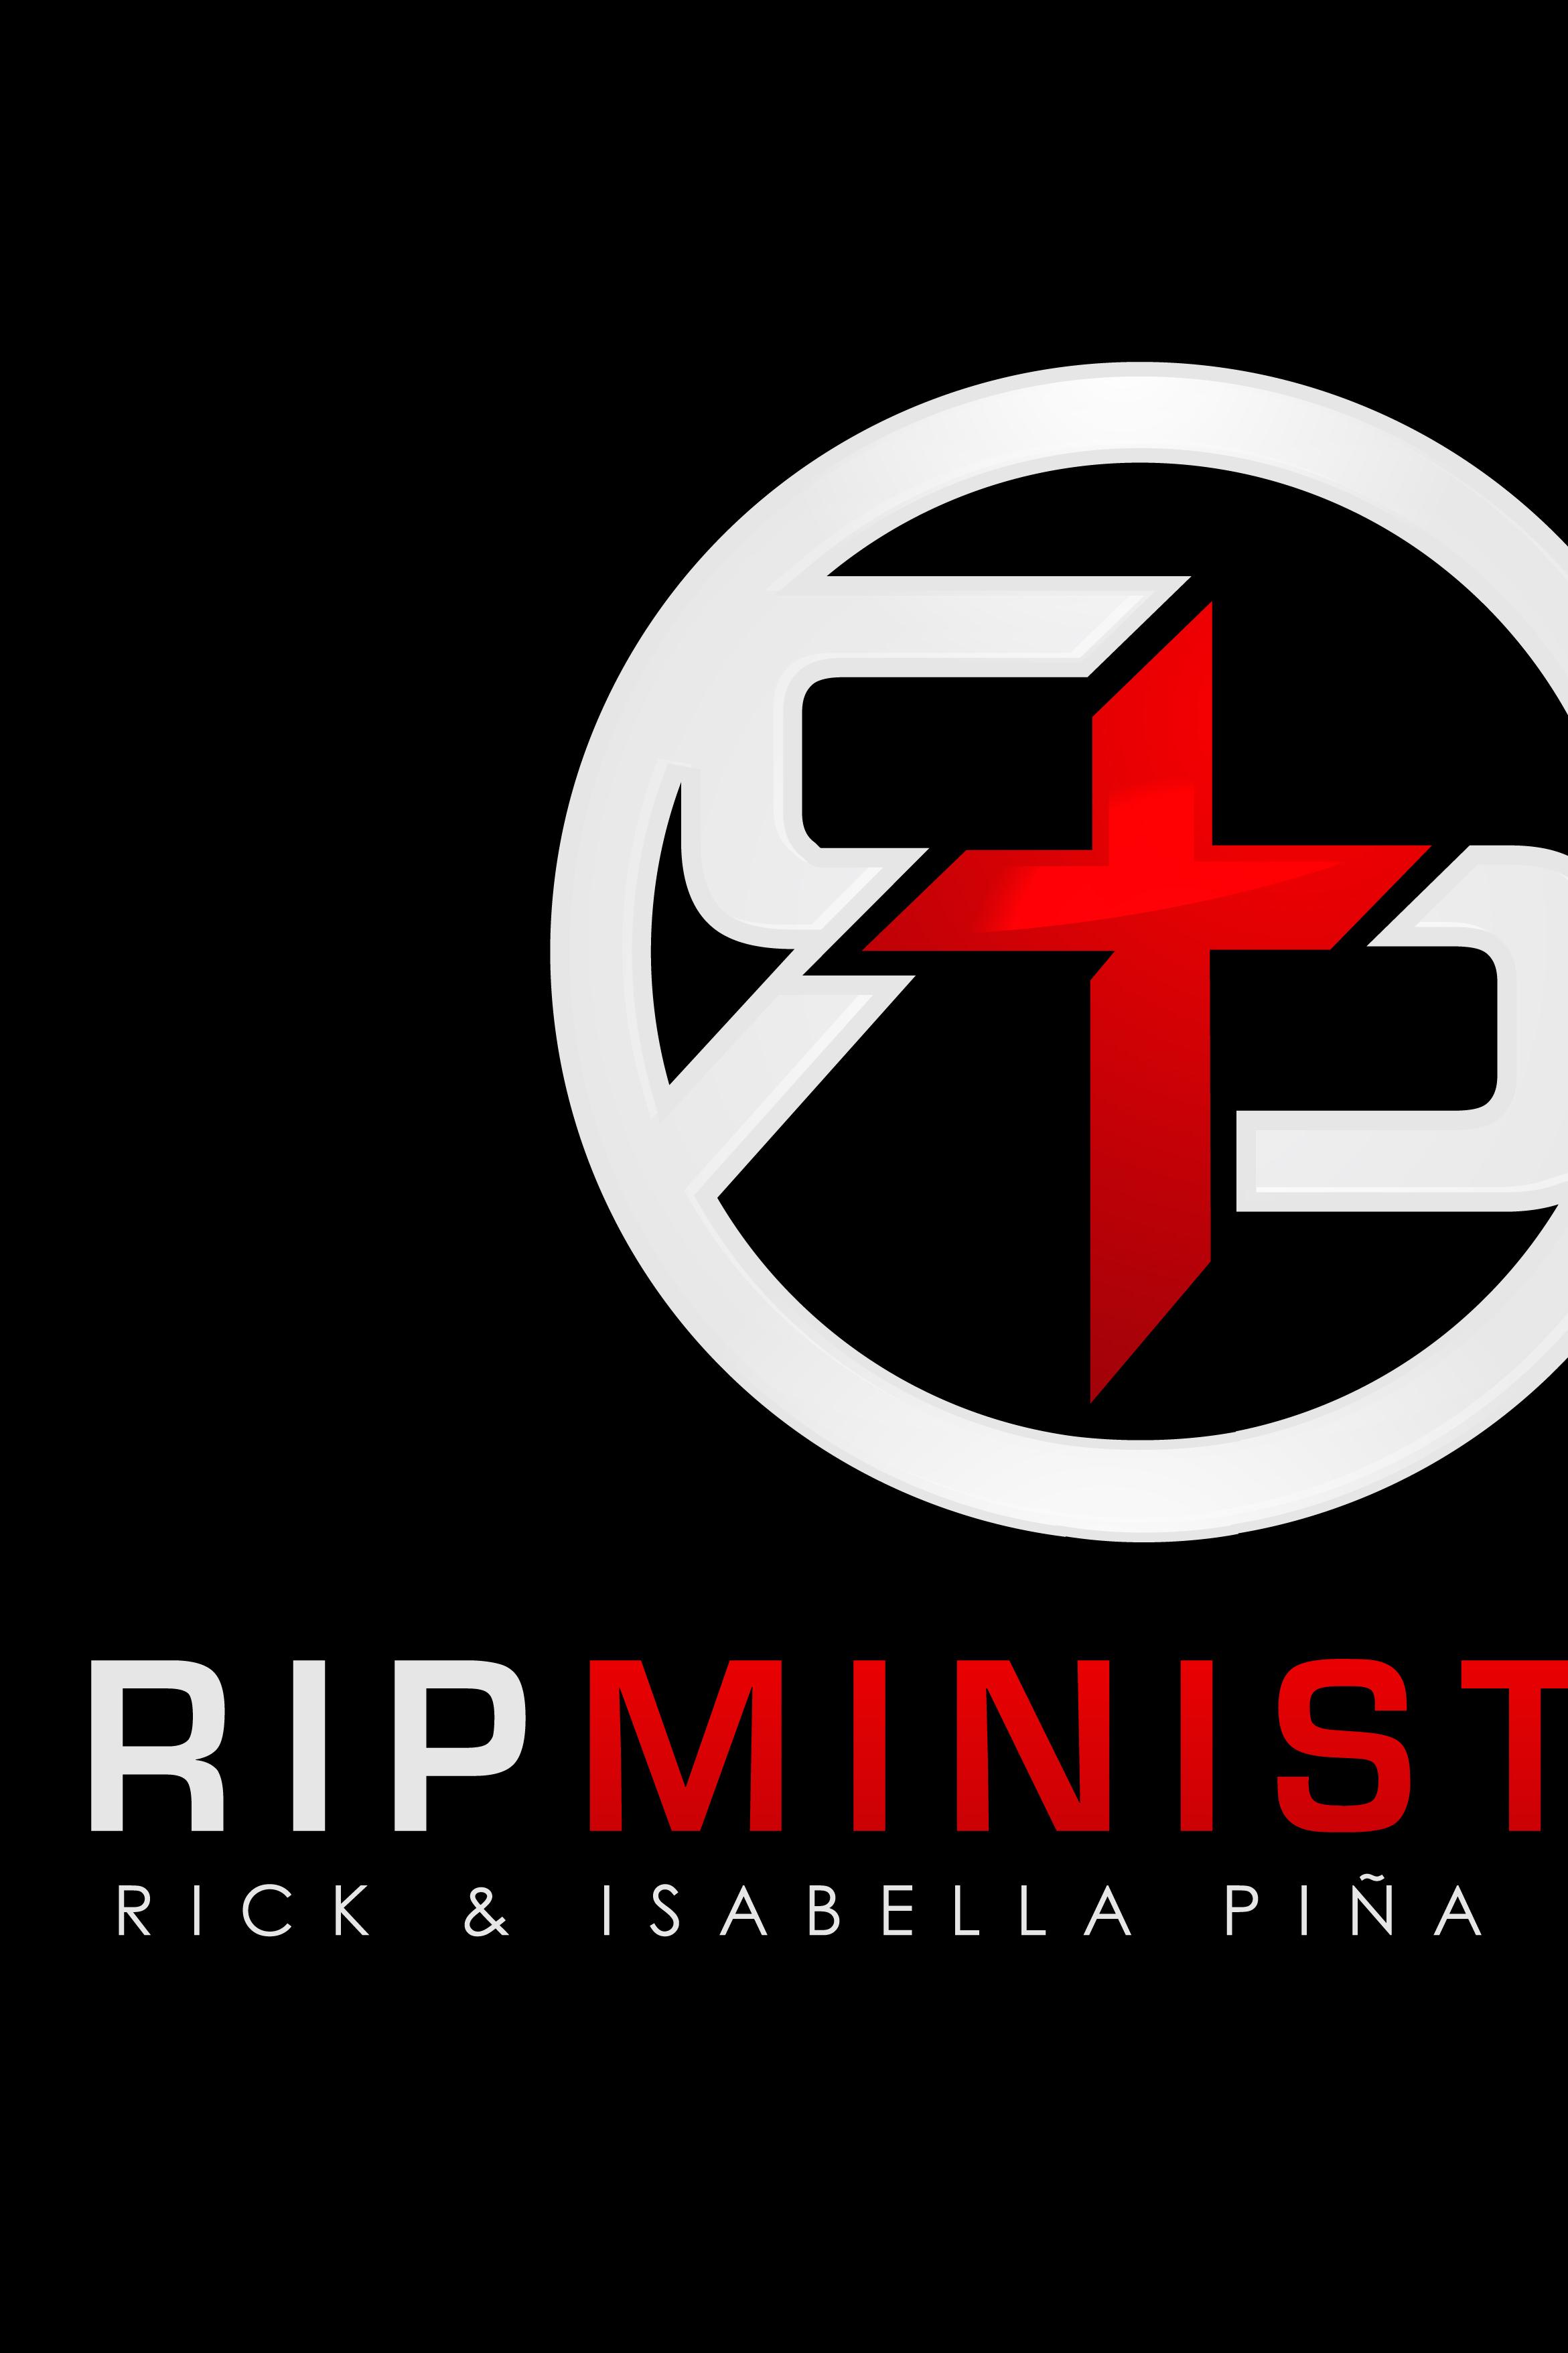 Rick & Isabella Pina Ministries on Livestream: http://livestream.com/rickpina/live